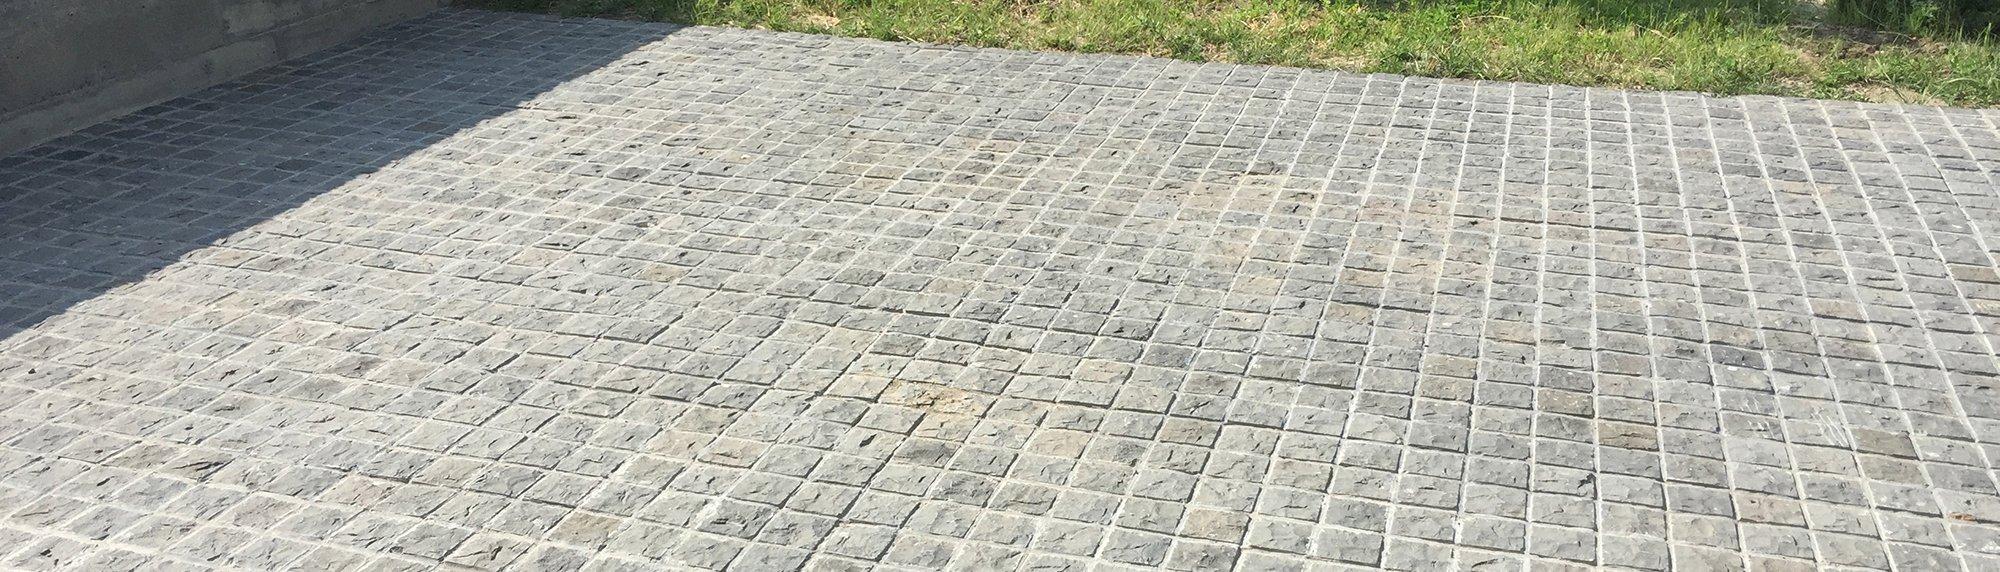 Basalt Cobblestone driveway